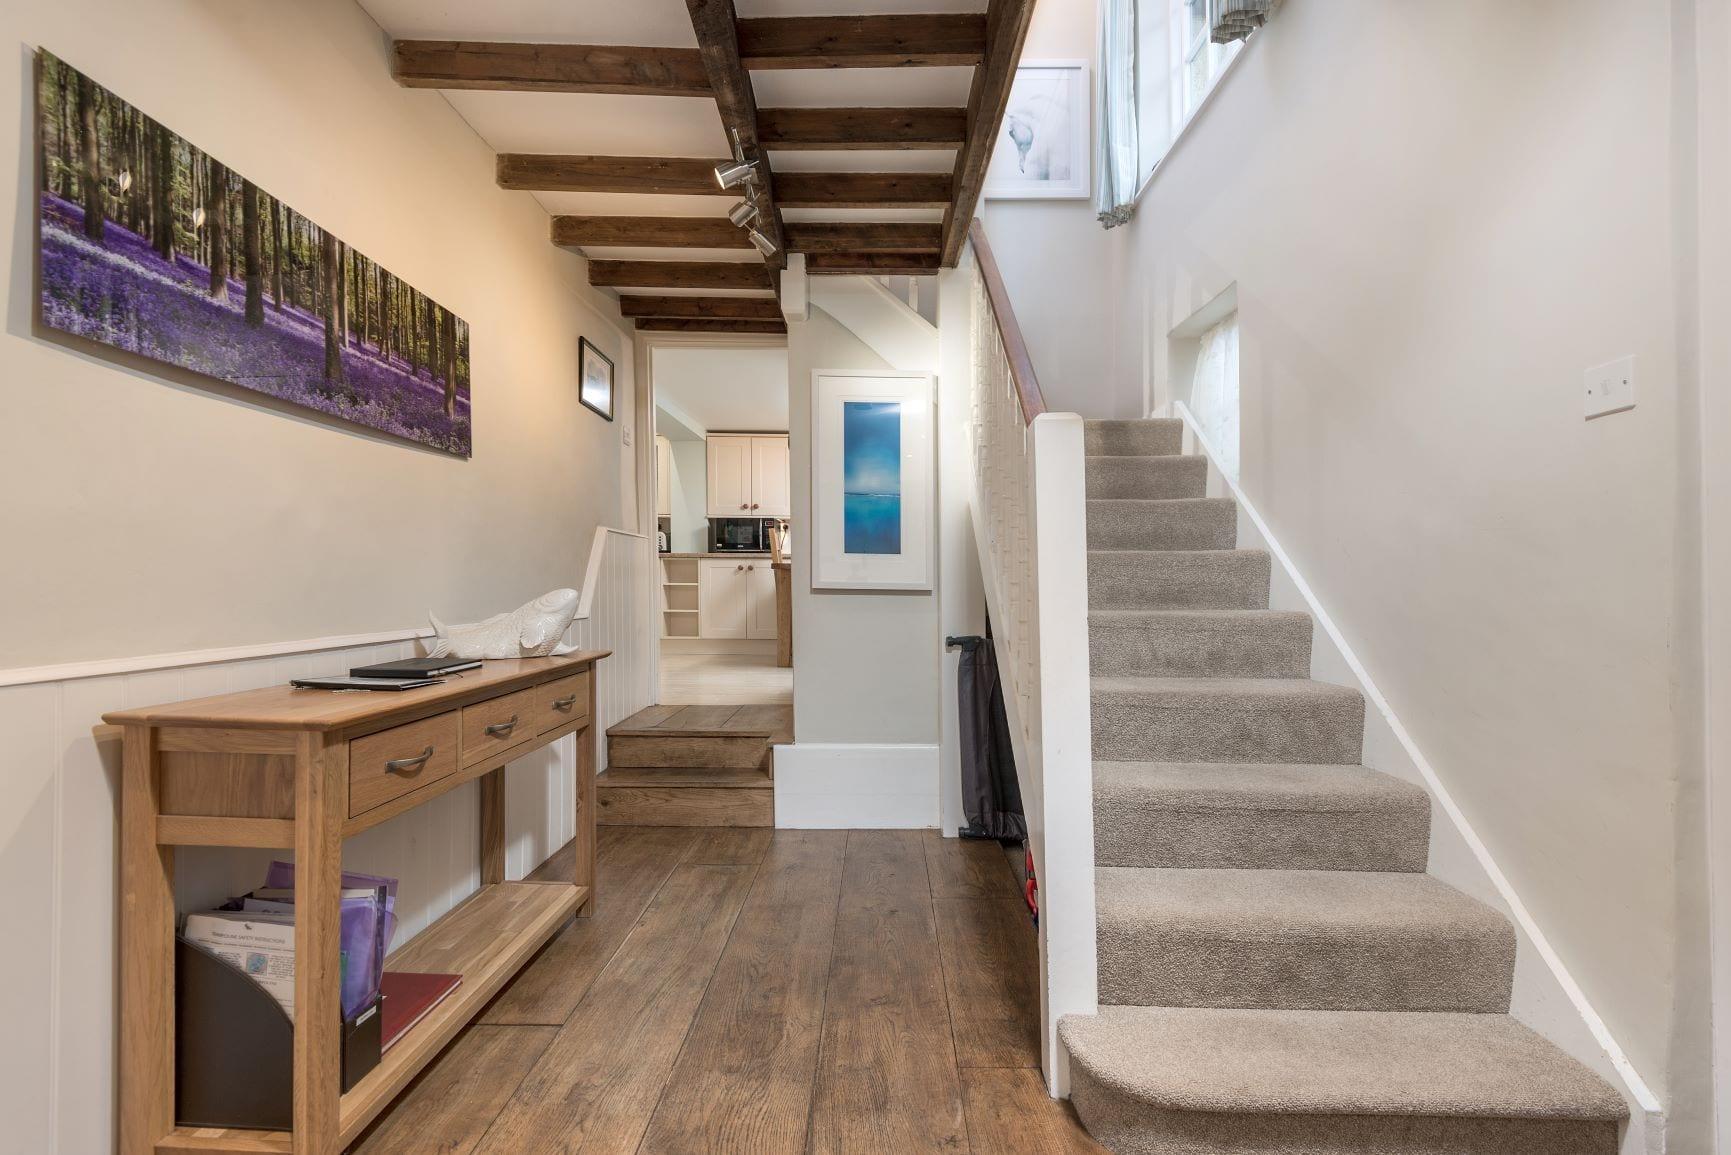 Beck Cottage, Hallway, Stairs